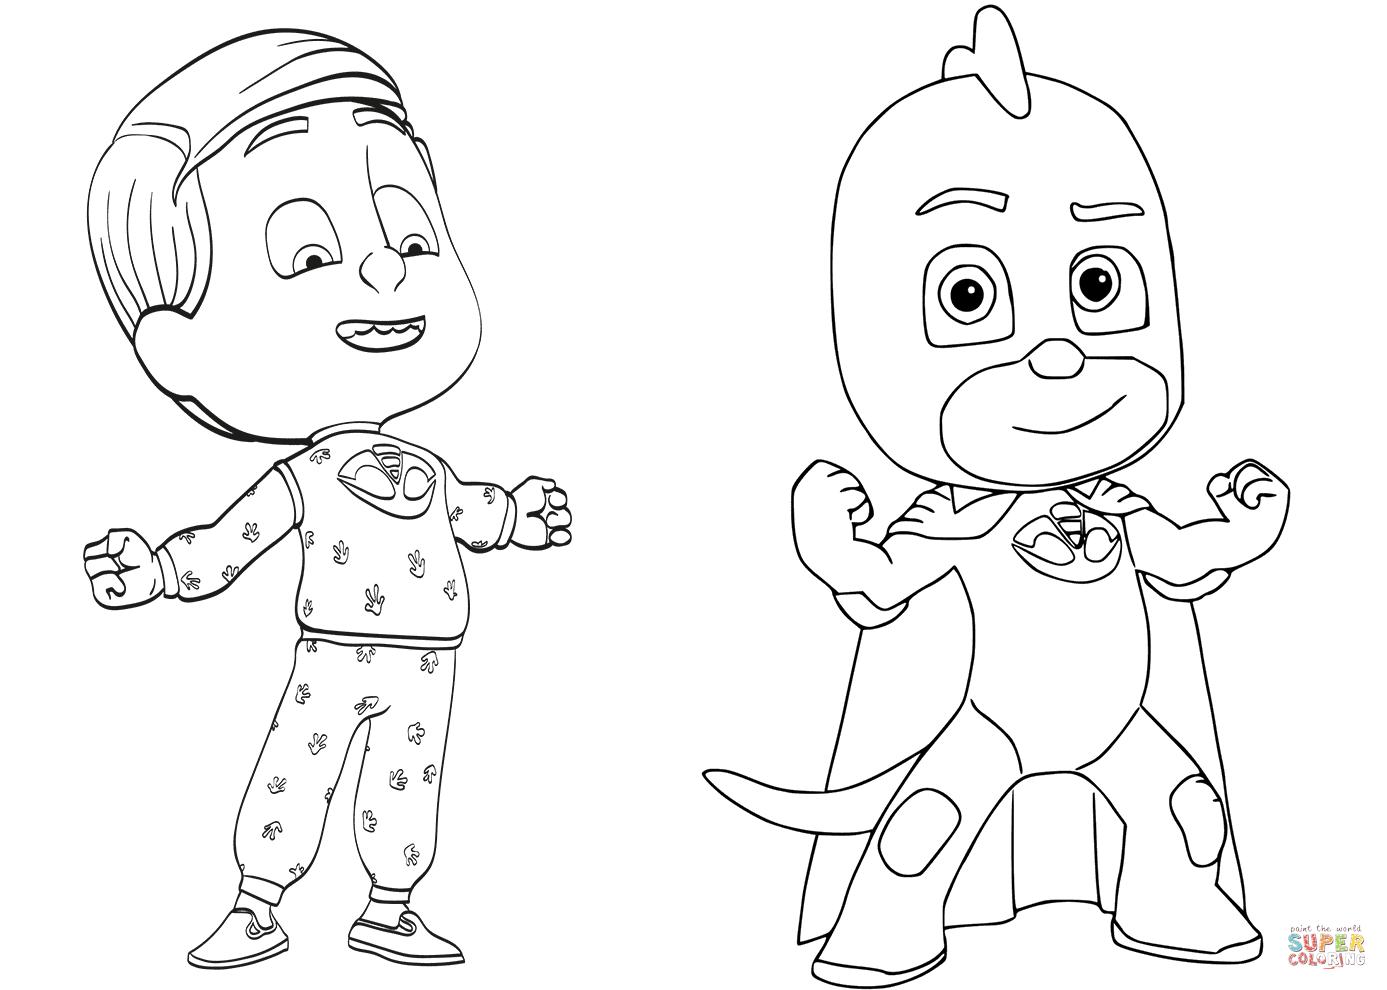 Pajama Hero Greg Is Gekko From Pj Masks Coloring Page